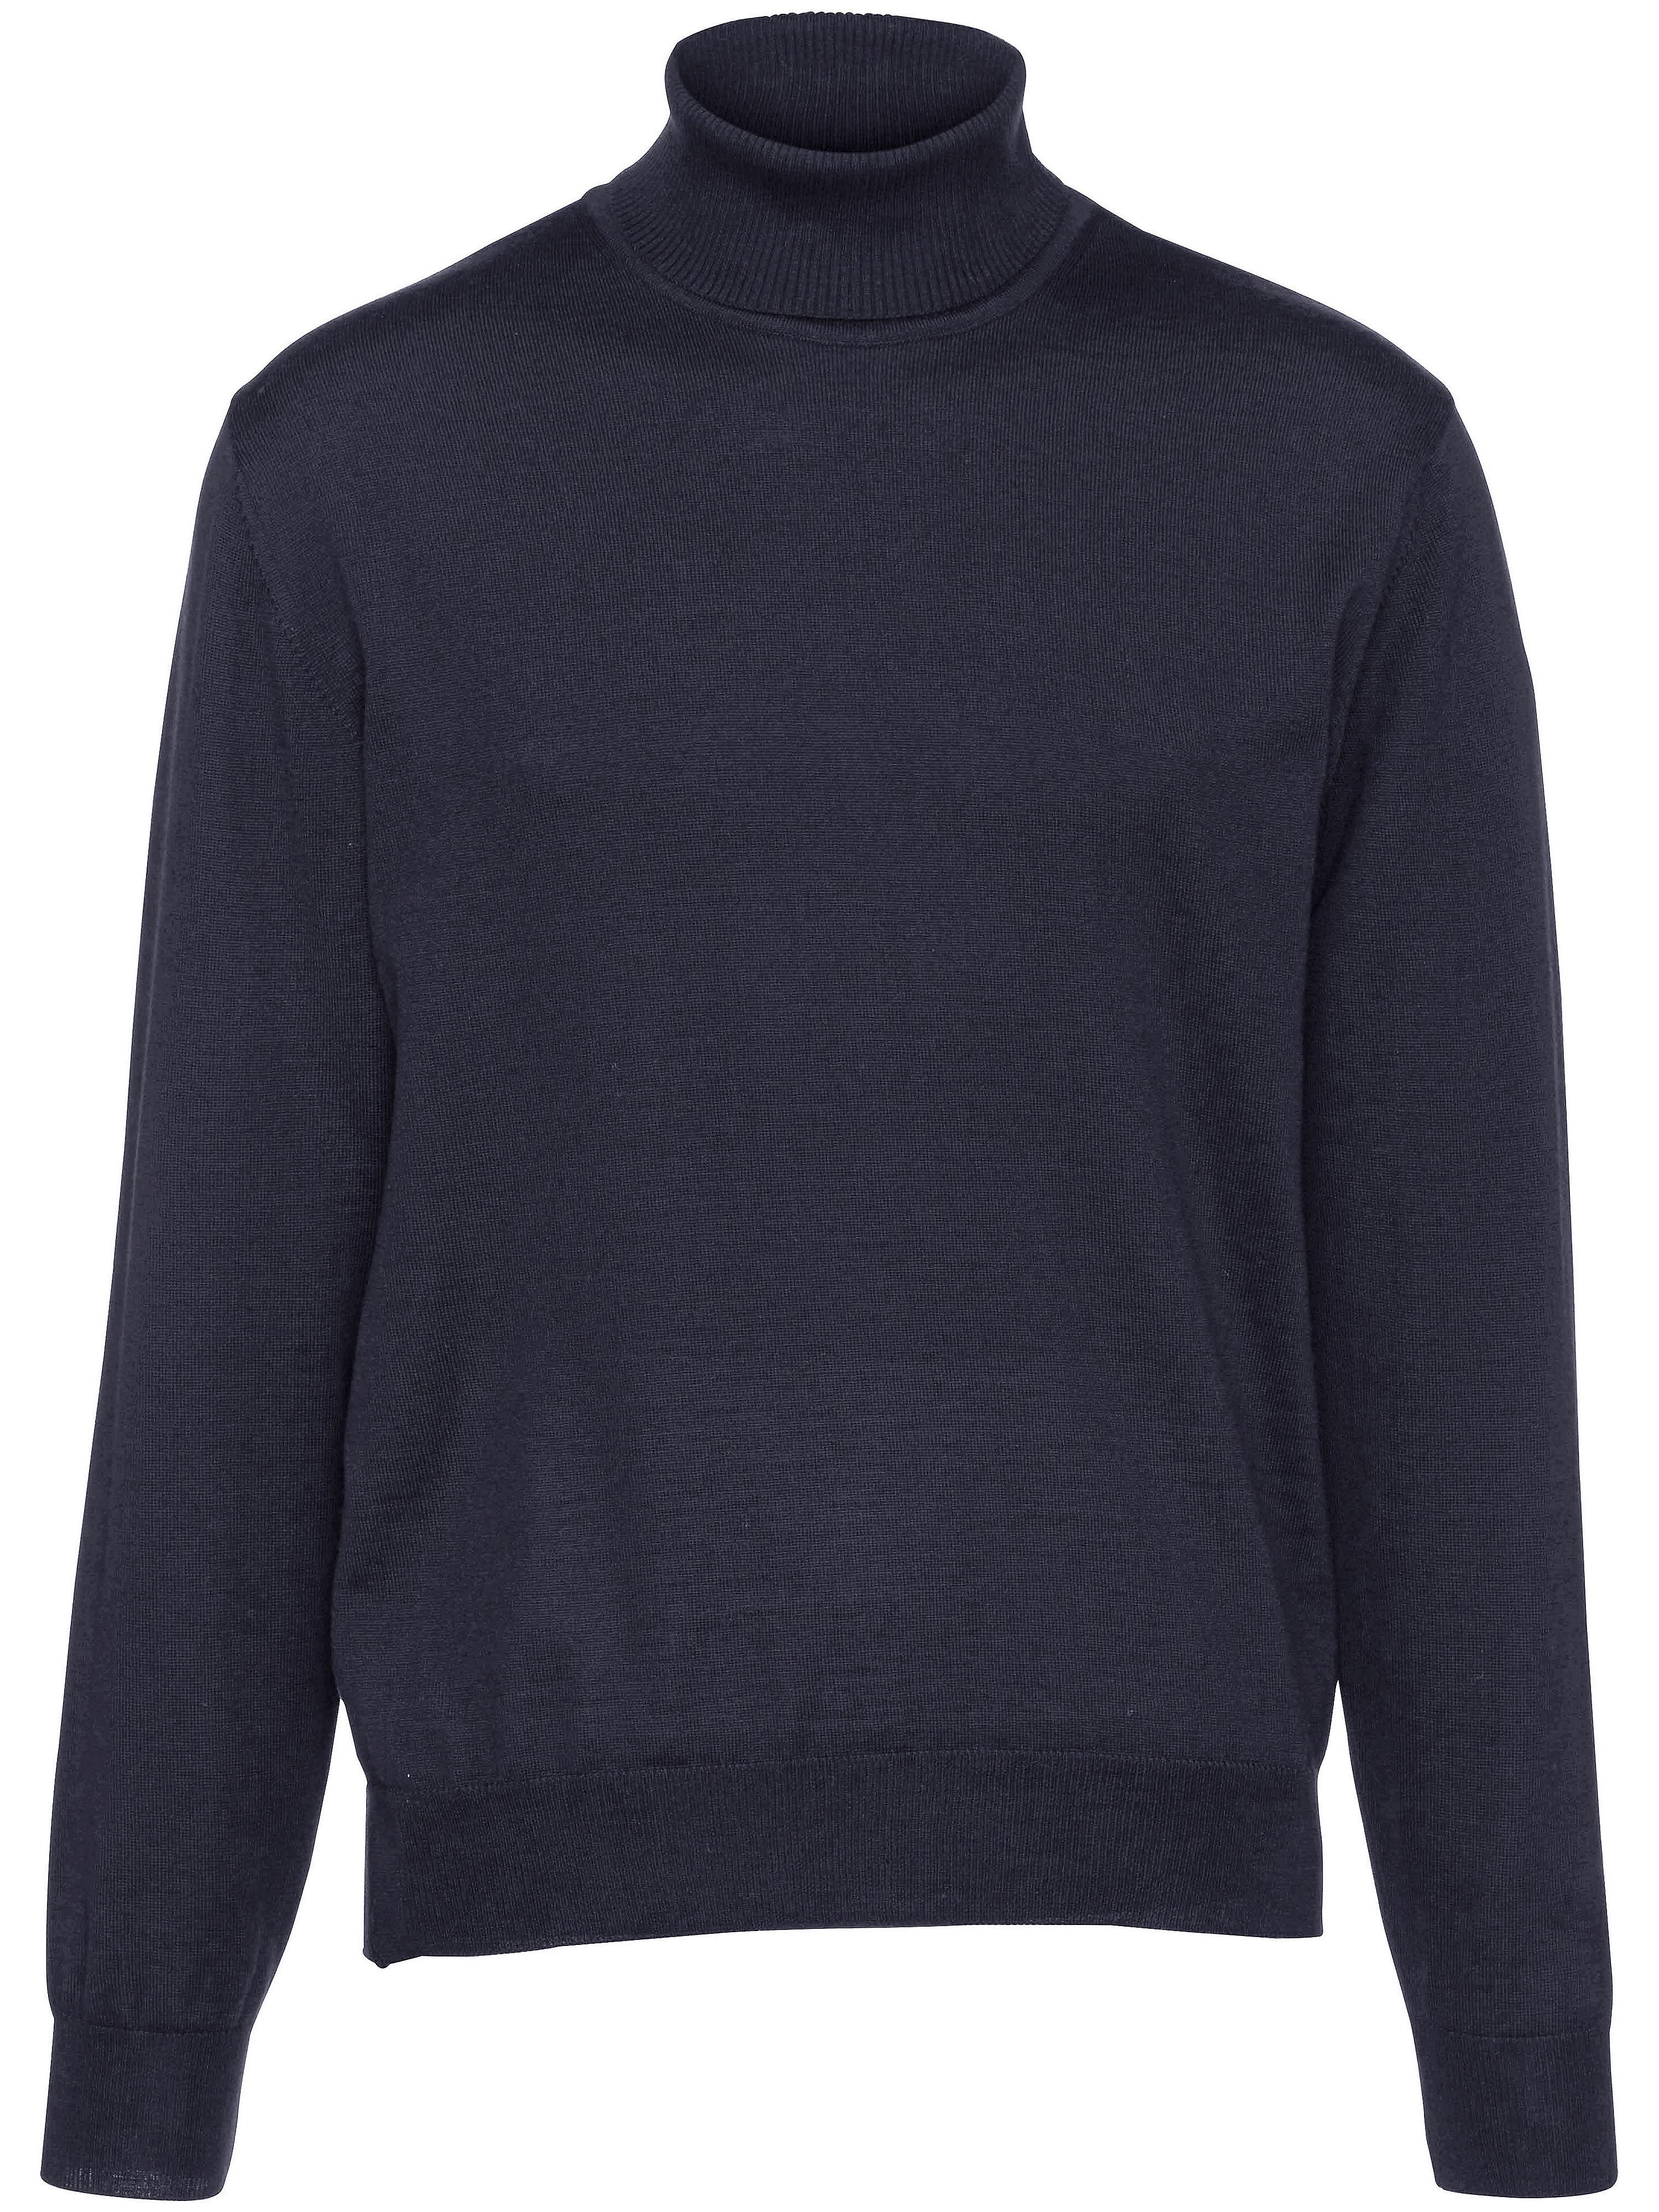 Image of   Rullekravebluse i 100% ren ny uld Fra Peter Hahn blå